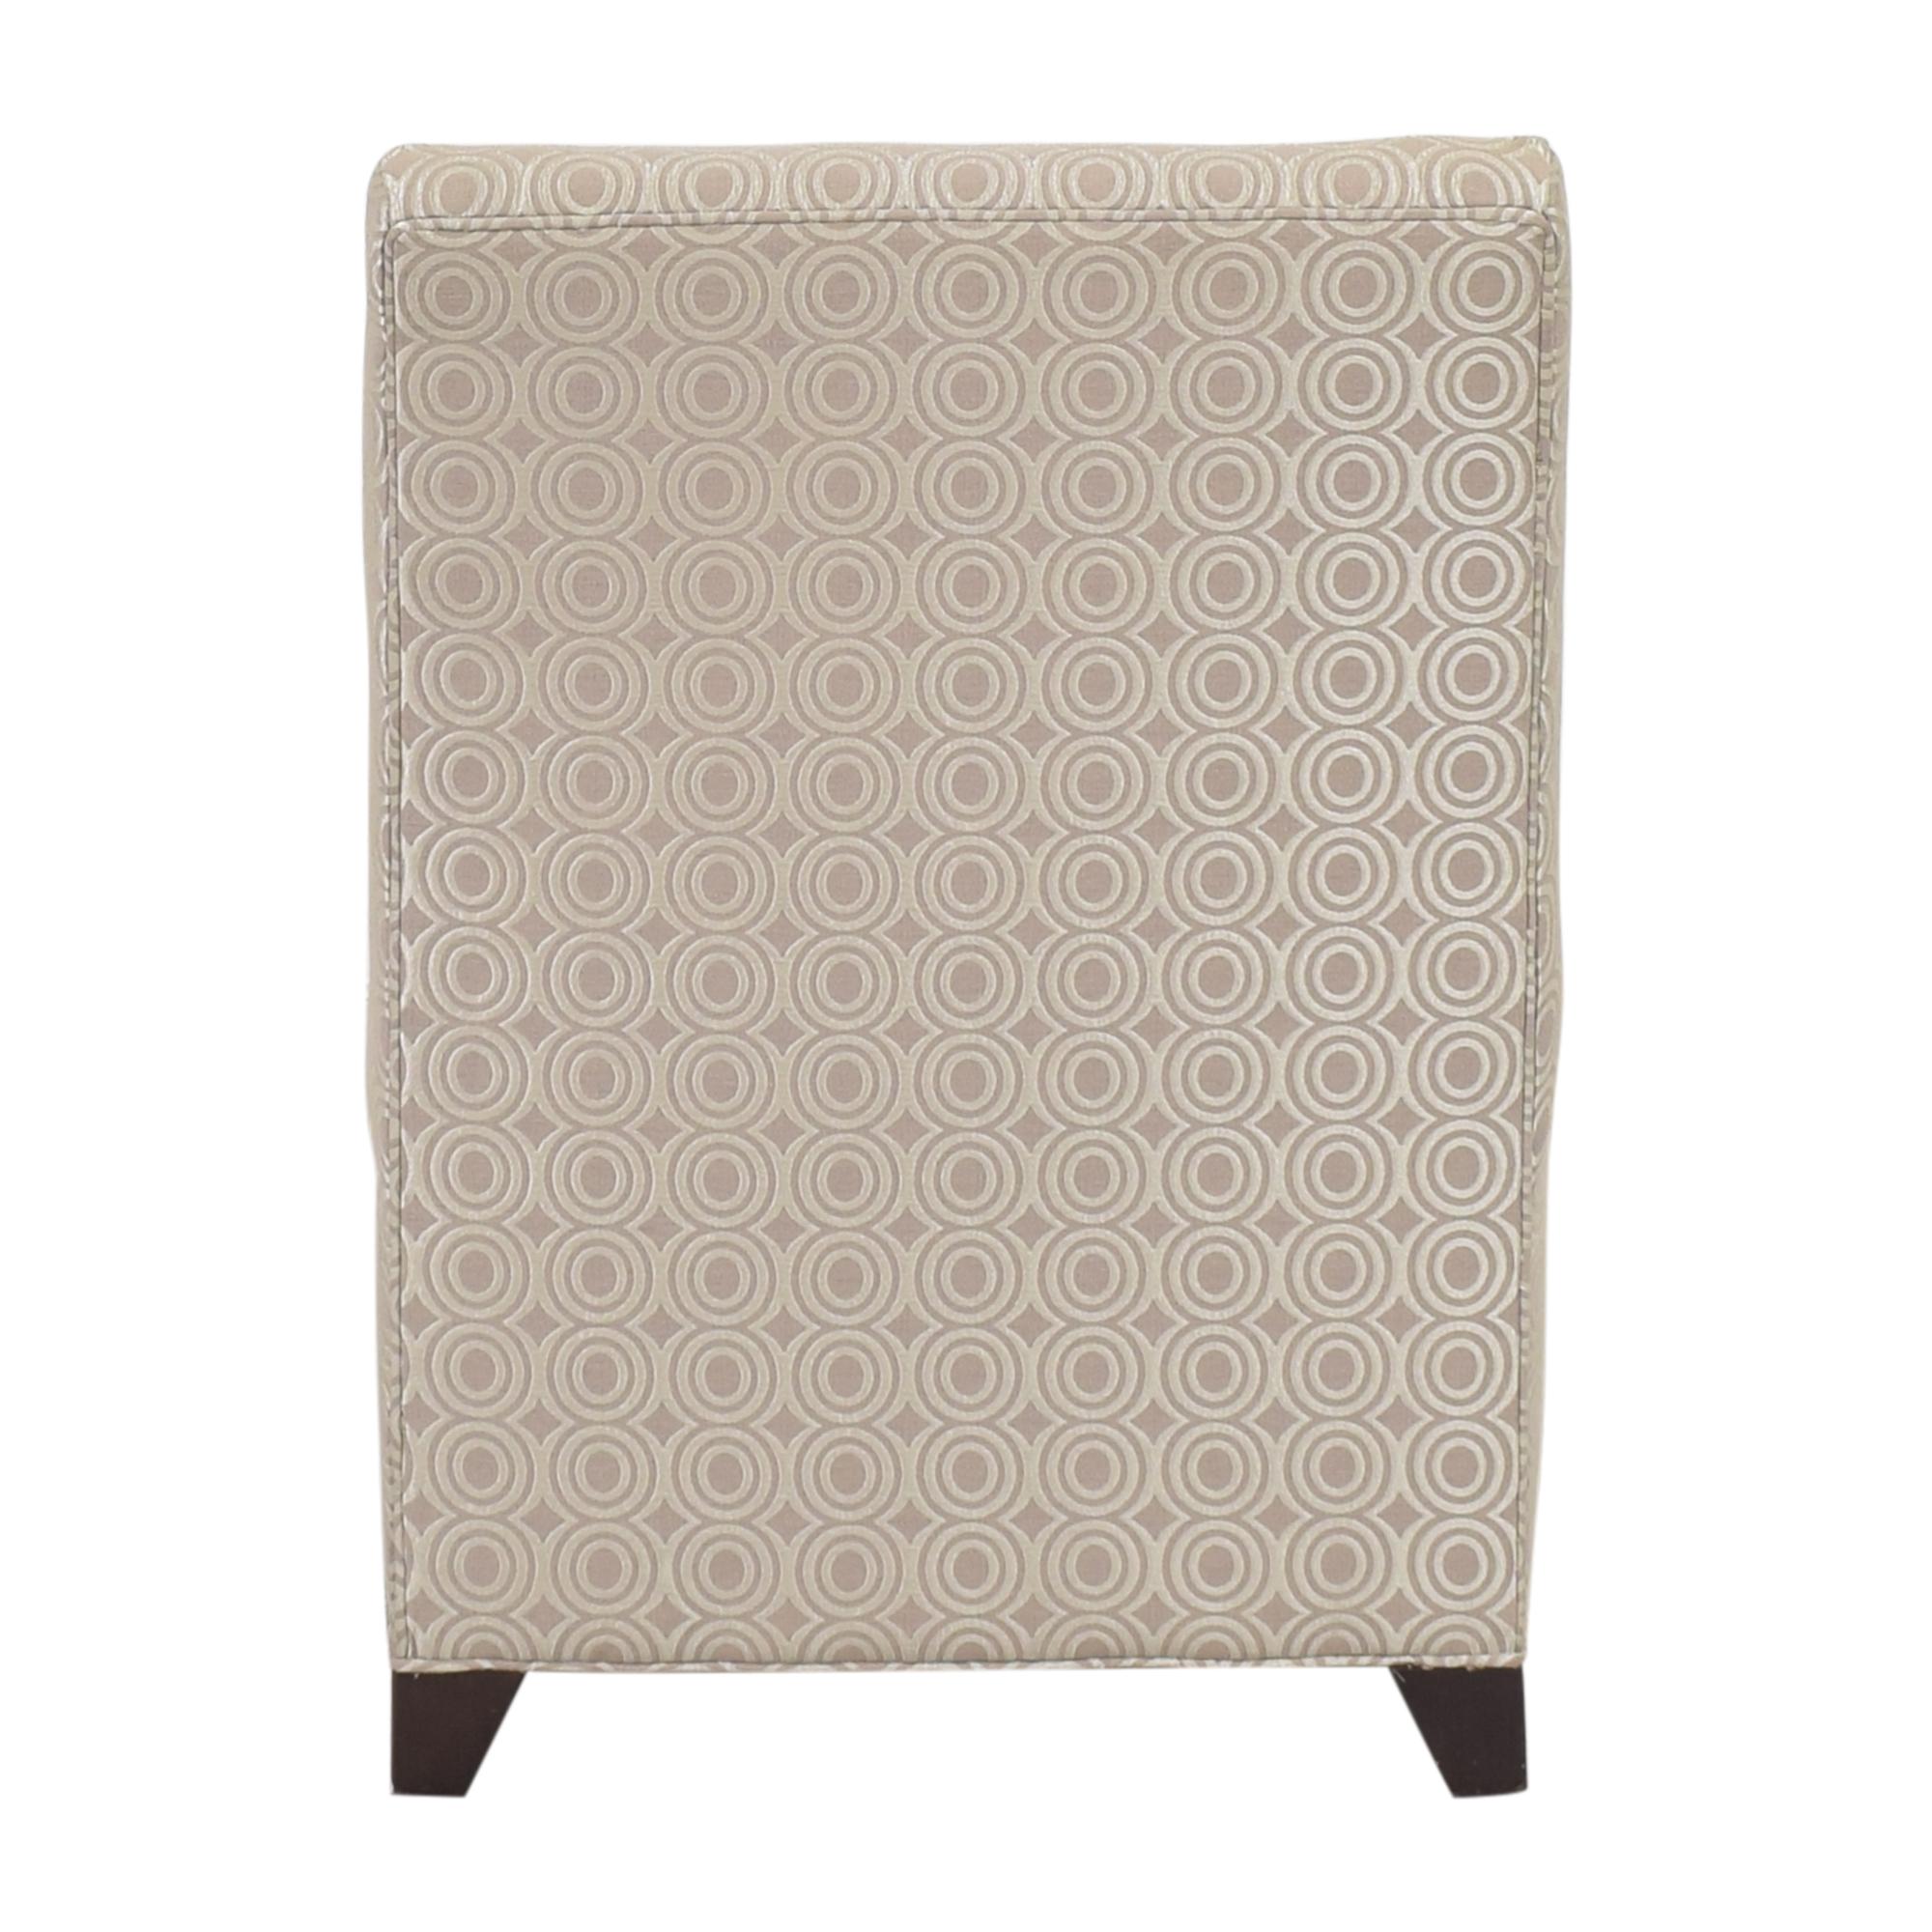 Ethan Allen Ethan Allen Slipper Accent Chair with Ottoman dimensions